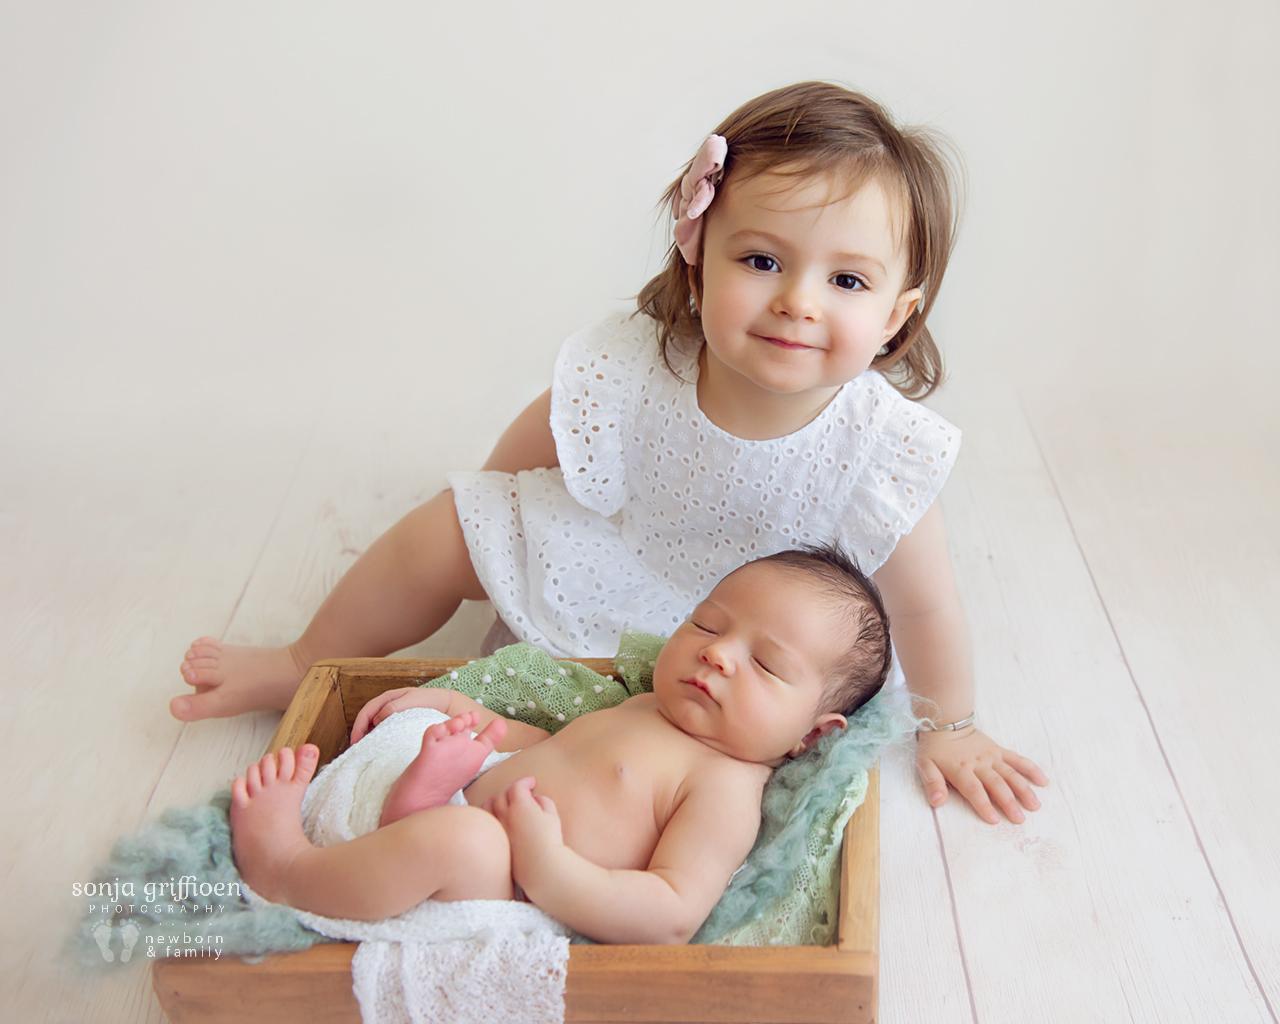 George-Newborn-Brisbane-Newborn-Photographer-Sonja-Griffioen-06.jpg